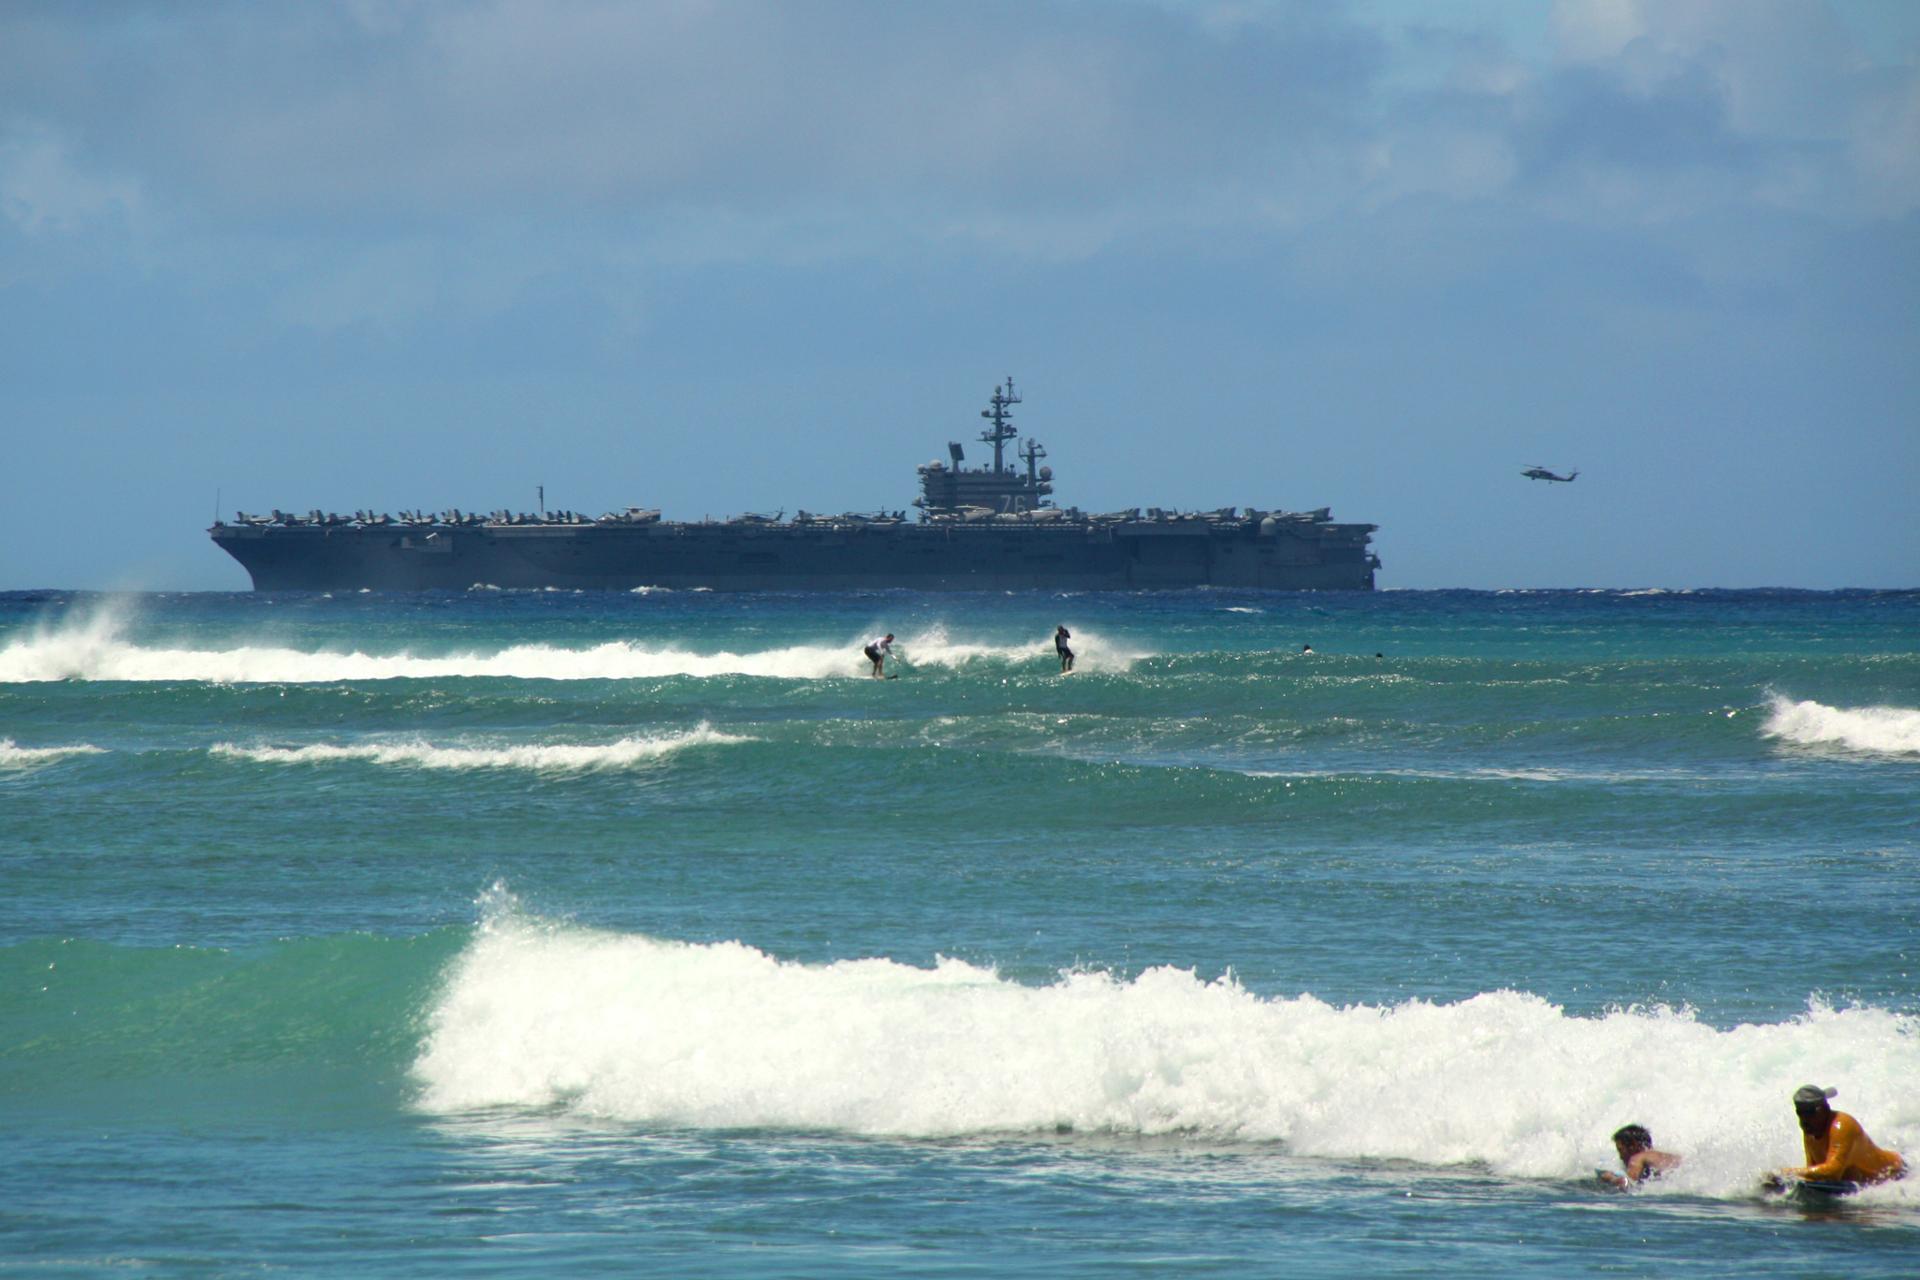 US power surfed